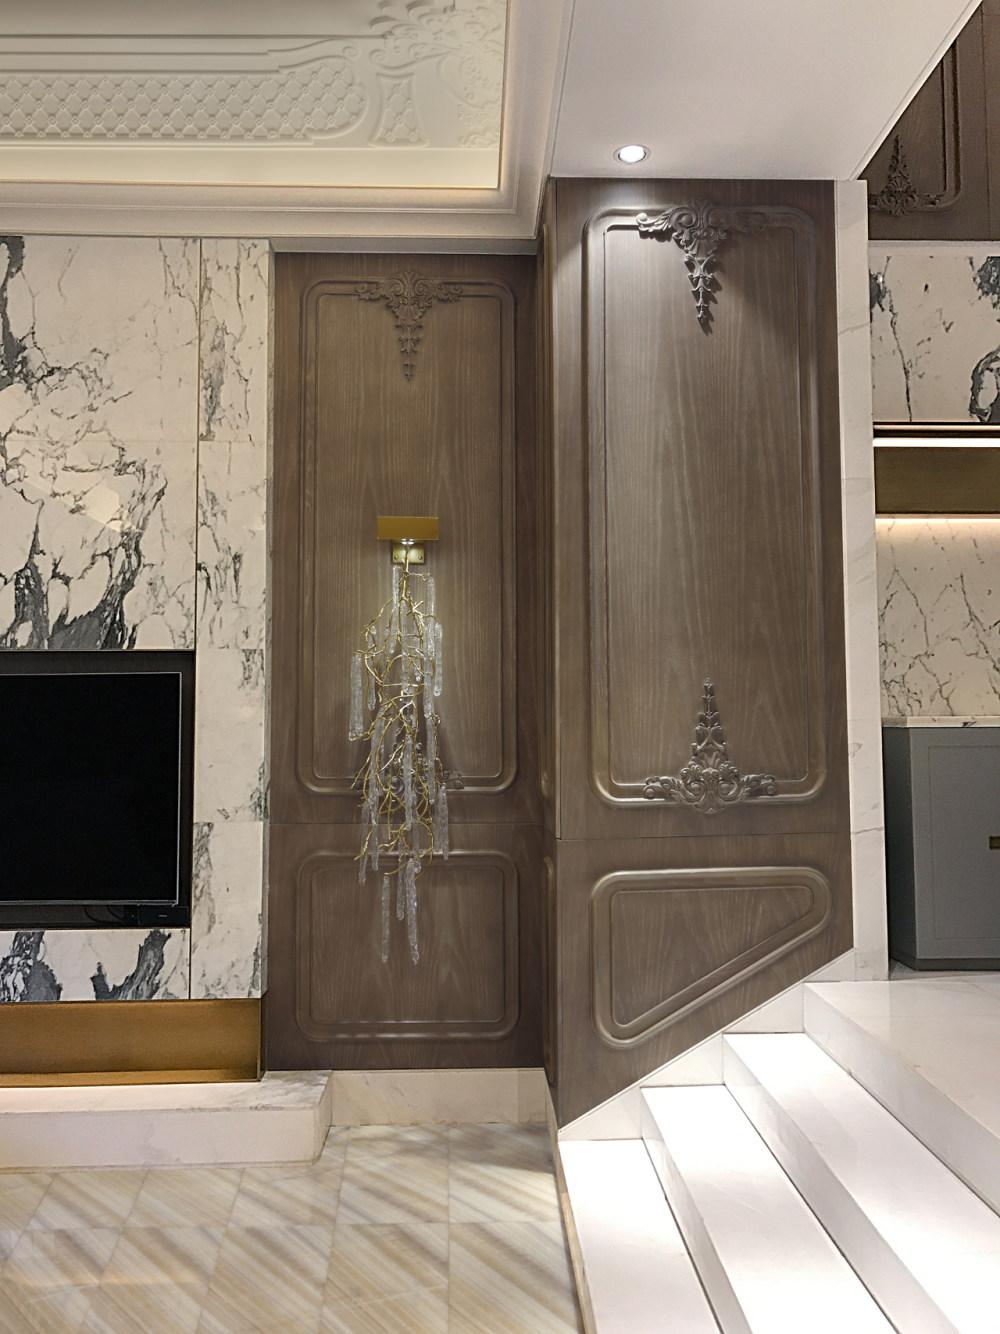 KSL设计事务所新作| 重塑空间| 唐山唐城壹零壹别墅_004.jpg